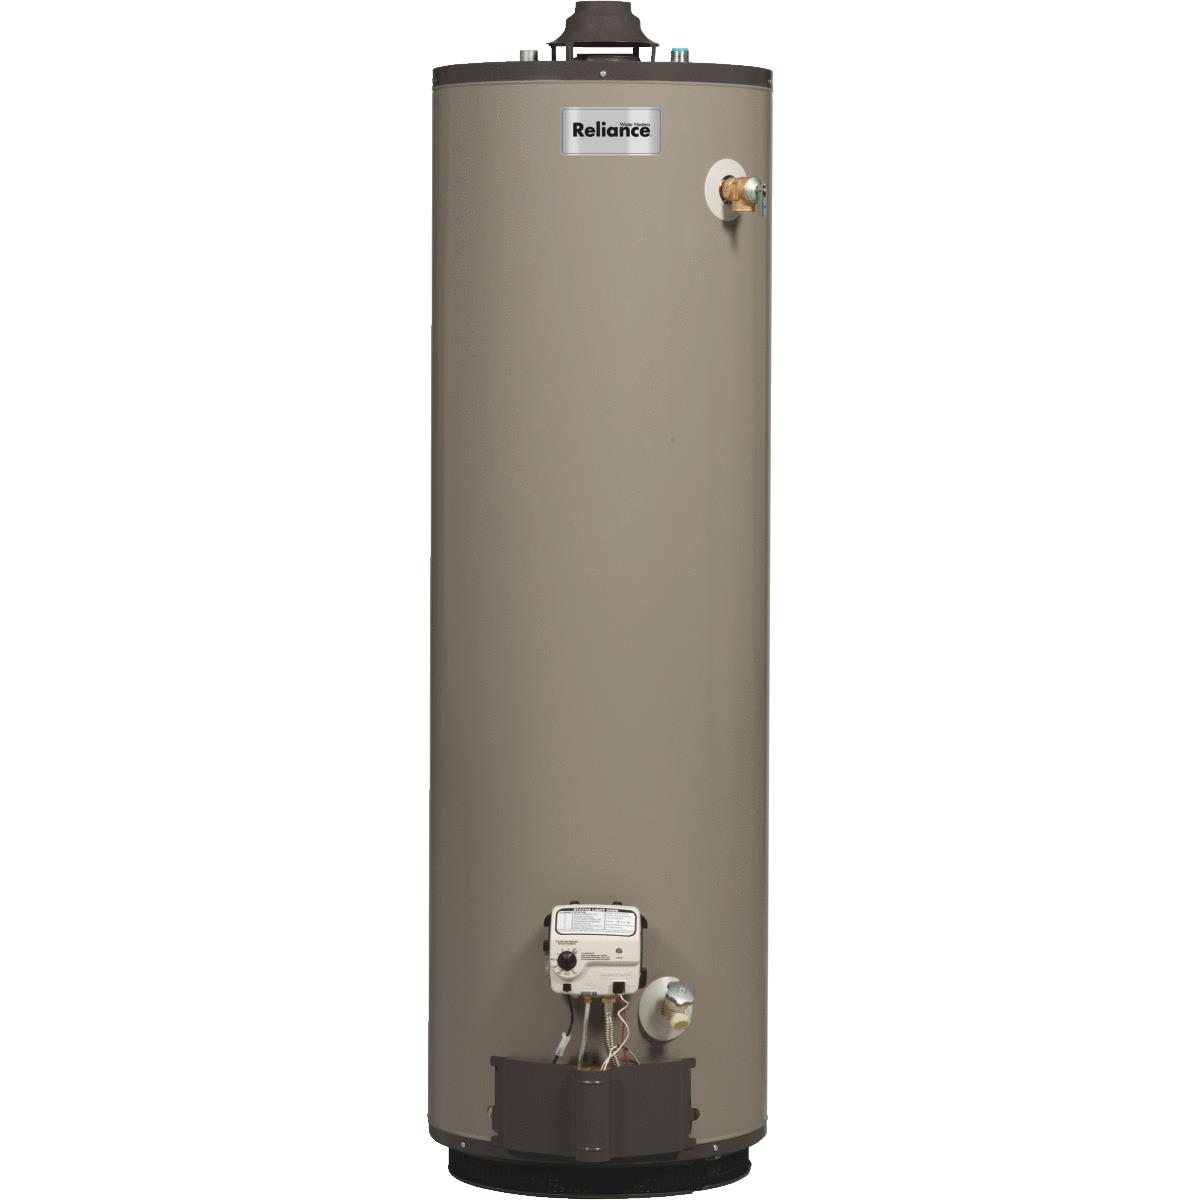 Reliance 40gal Self-Cleaning Liquid Propane (LP) Gas Wate...